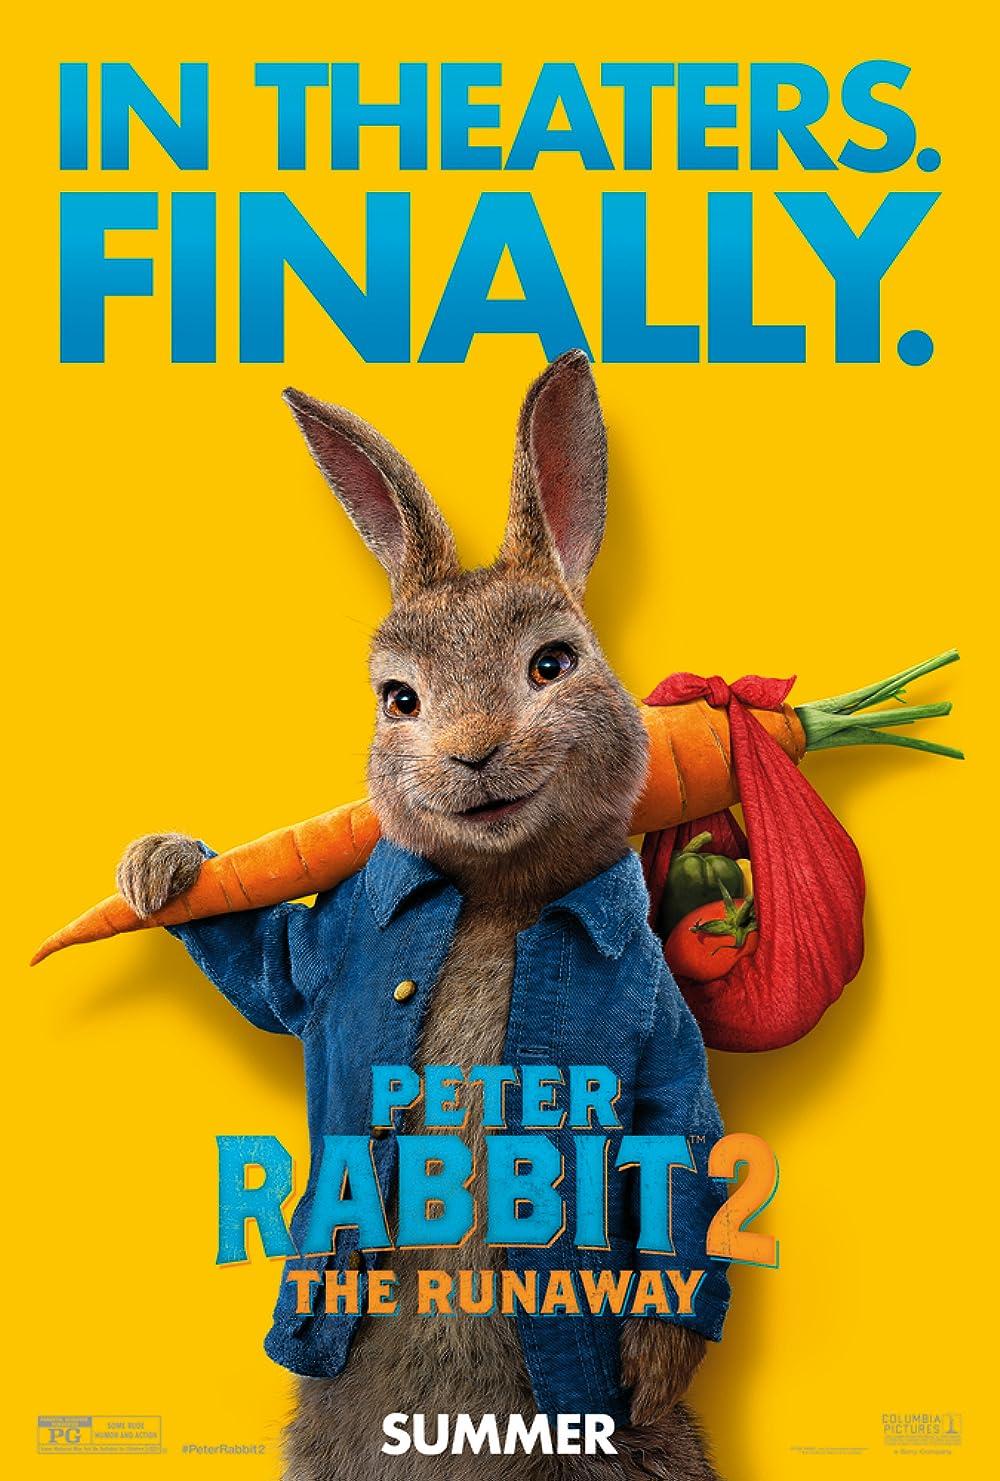 Peter Rabbit 2 The Runaway 2021 English 720p HDRip 850MB Download